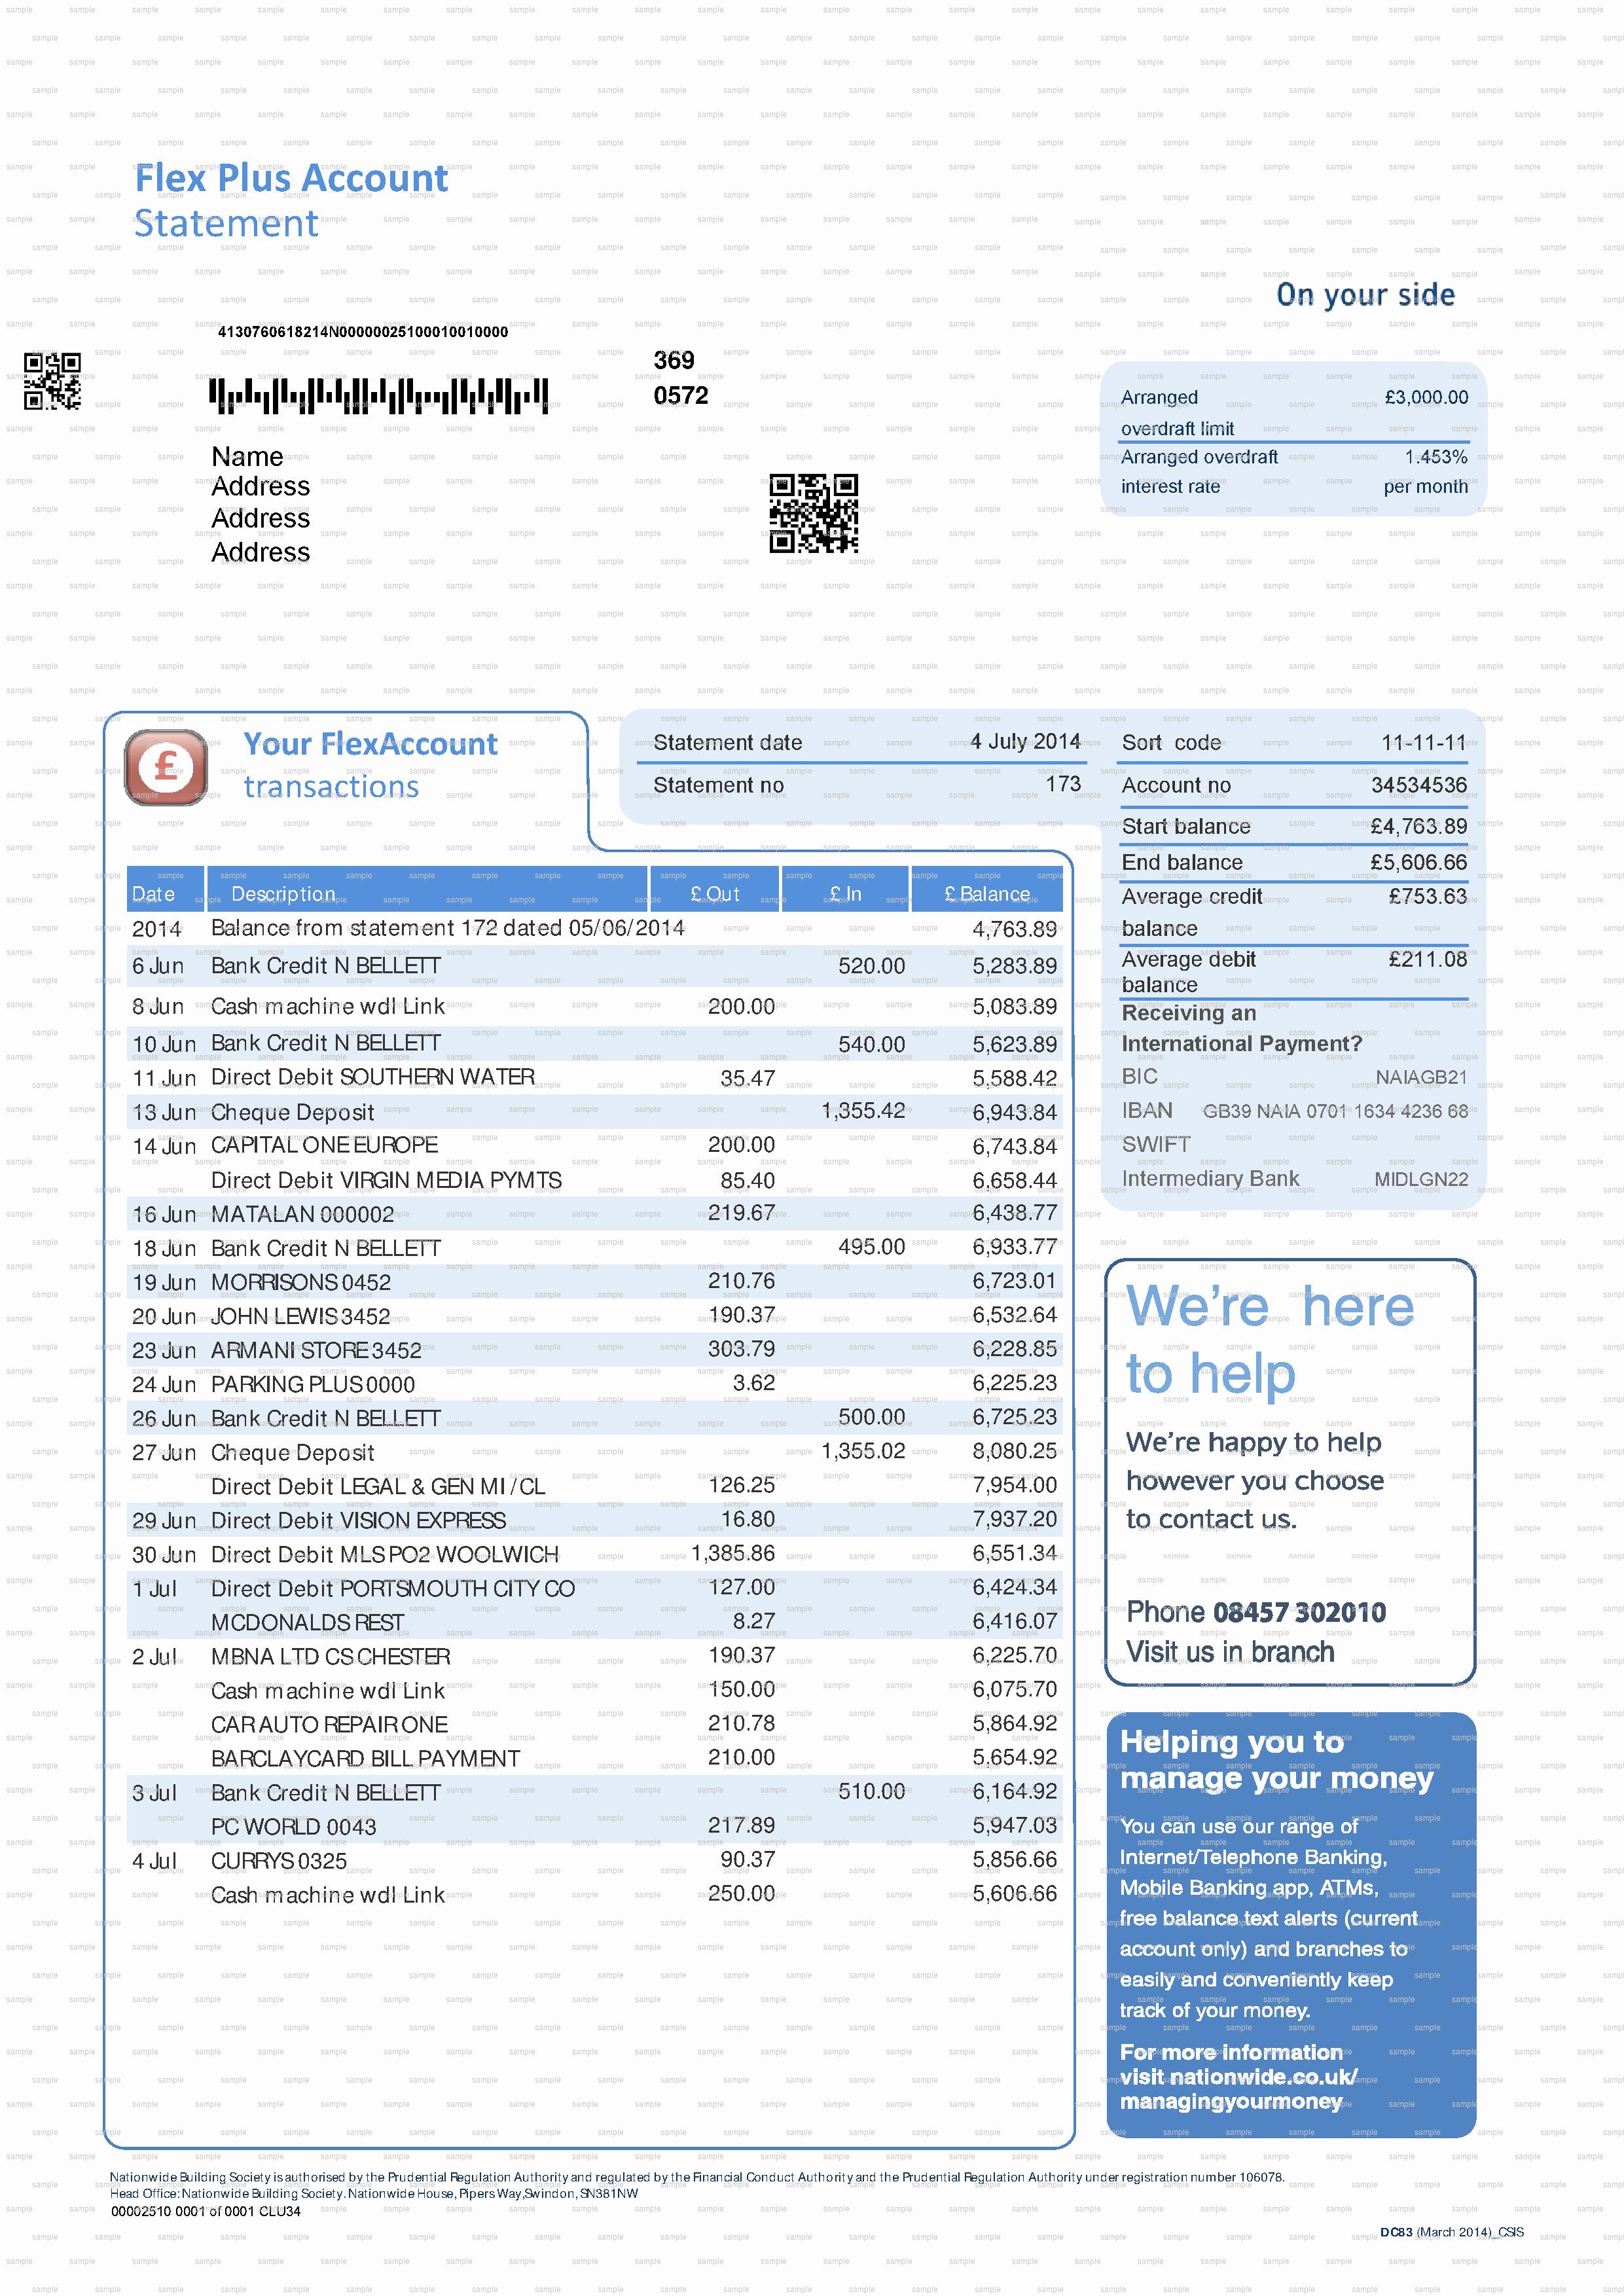 Fake Bank Statement Template Awesome Fake Documents Fake Bank Statements Fake Utility Bills